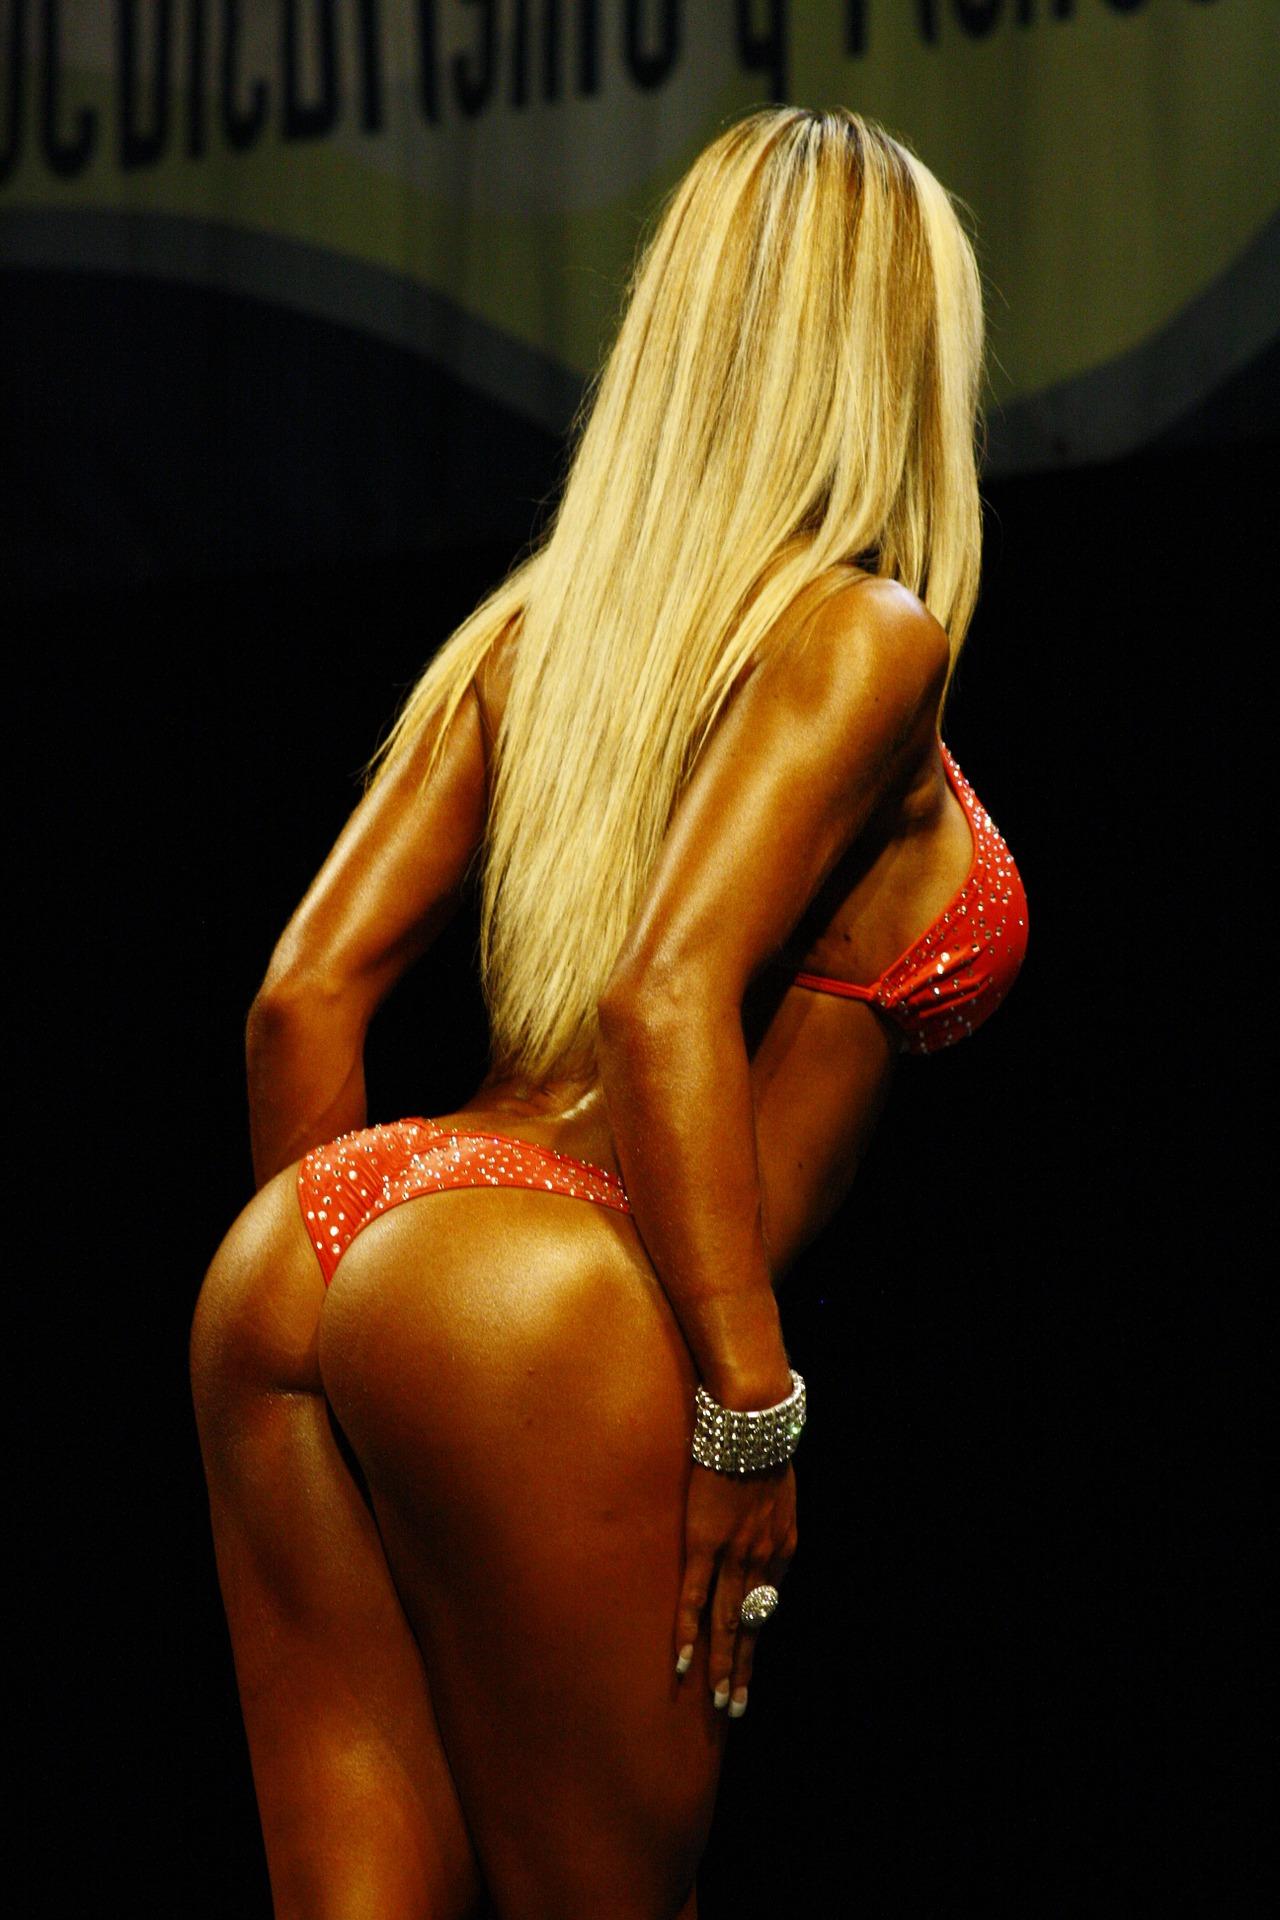 bodybuilding pixabay.pl